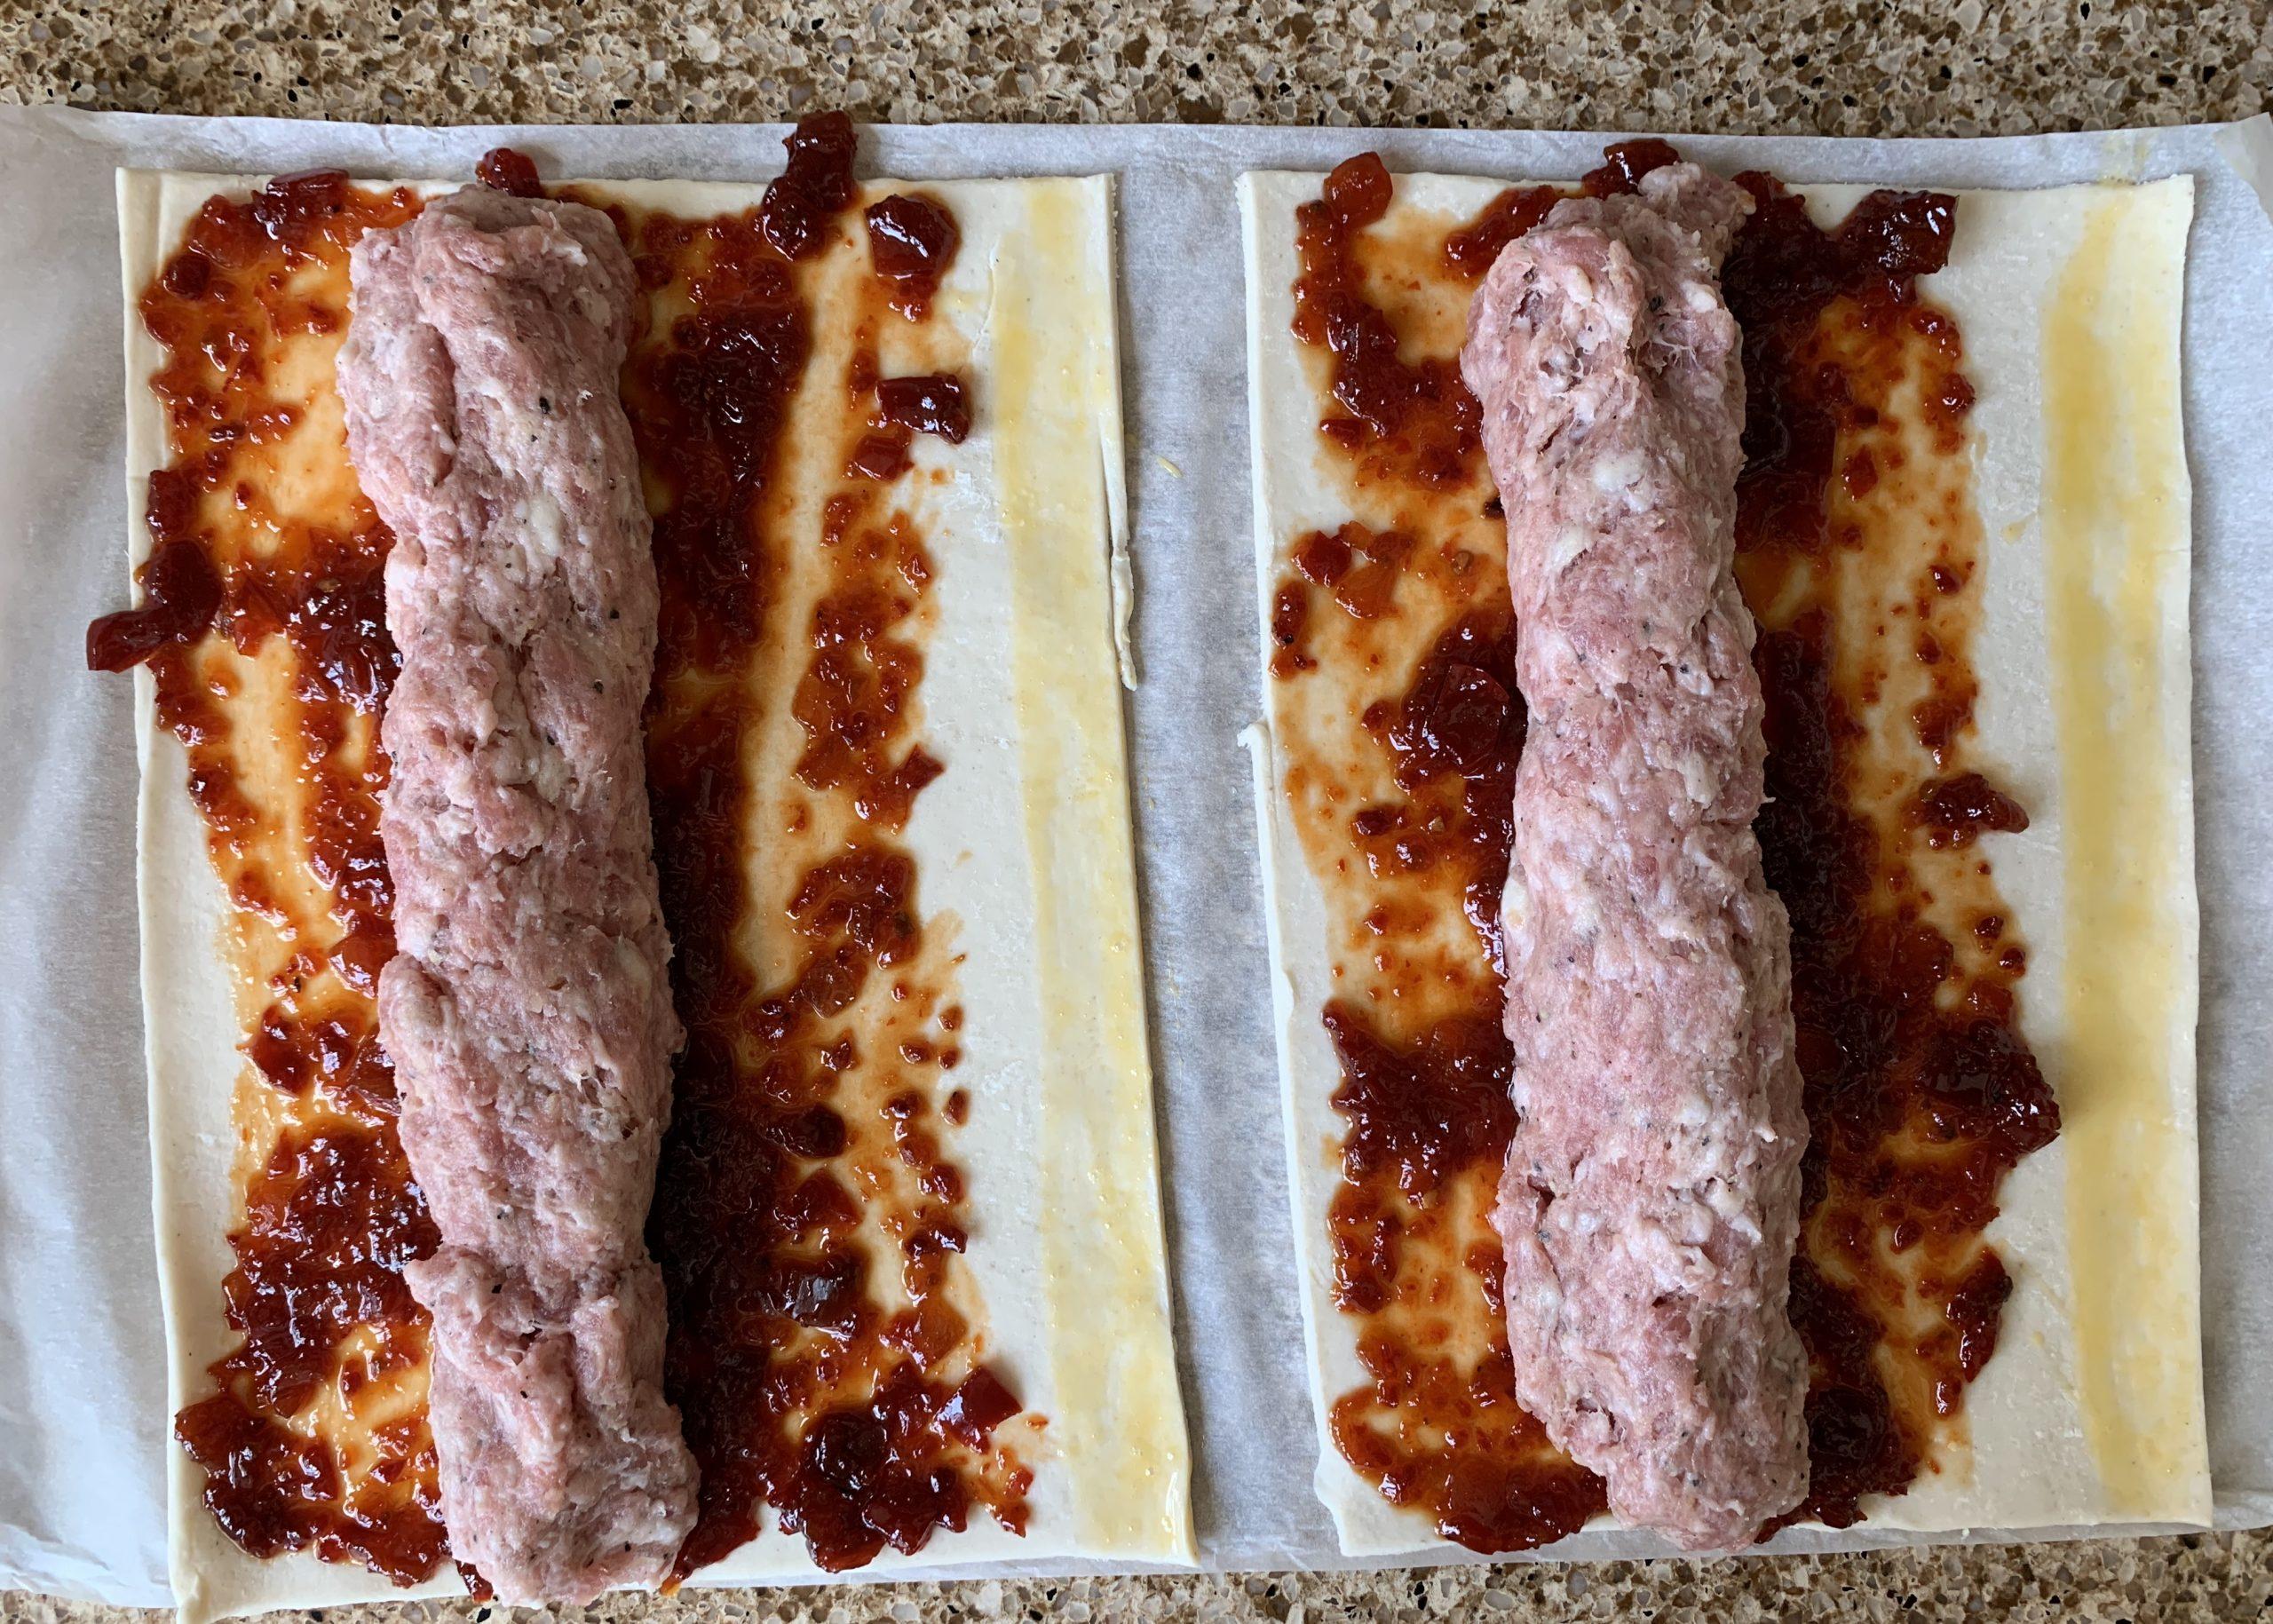 Making gluten free sausage rolls with chilli jam